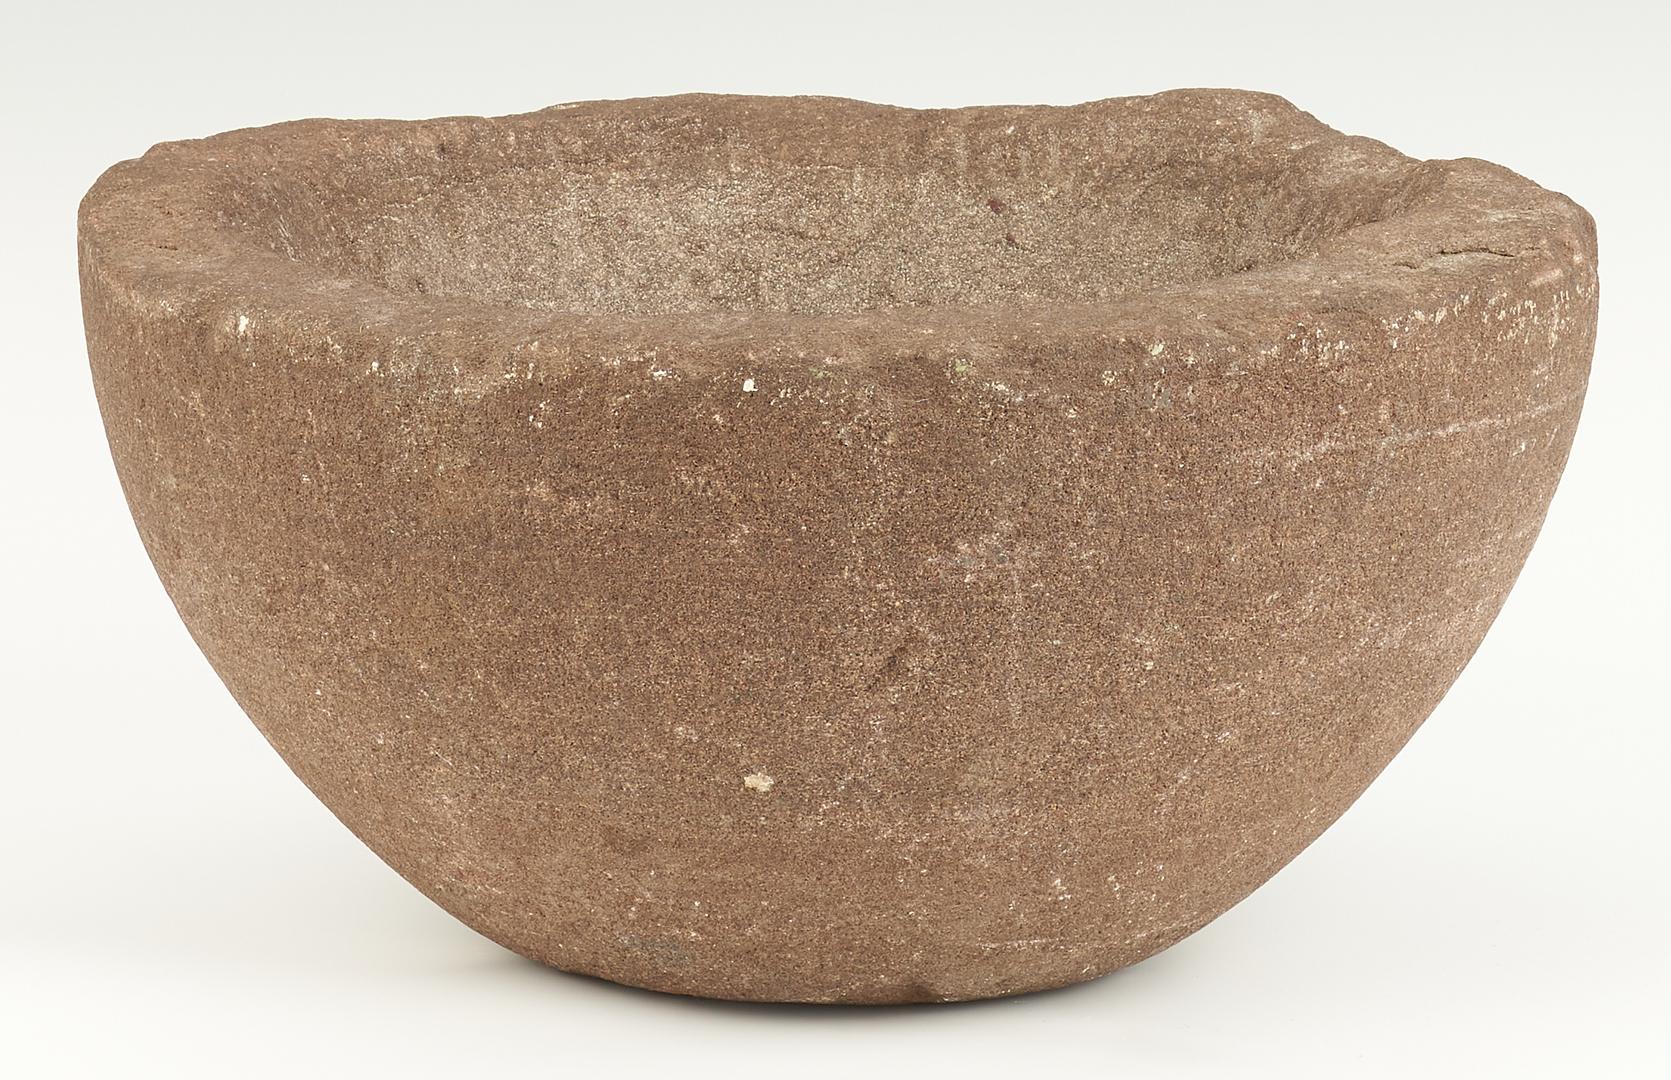 Lot 1054: Native American Mortar & Grinding Stone Pestle